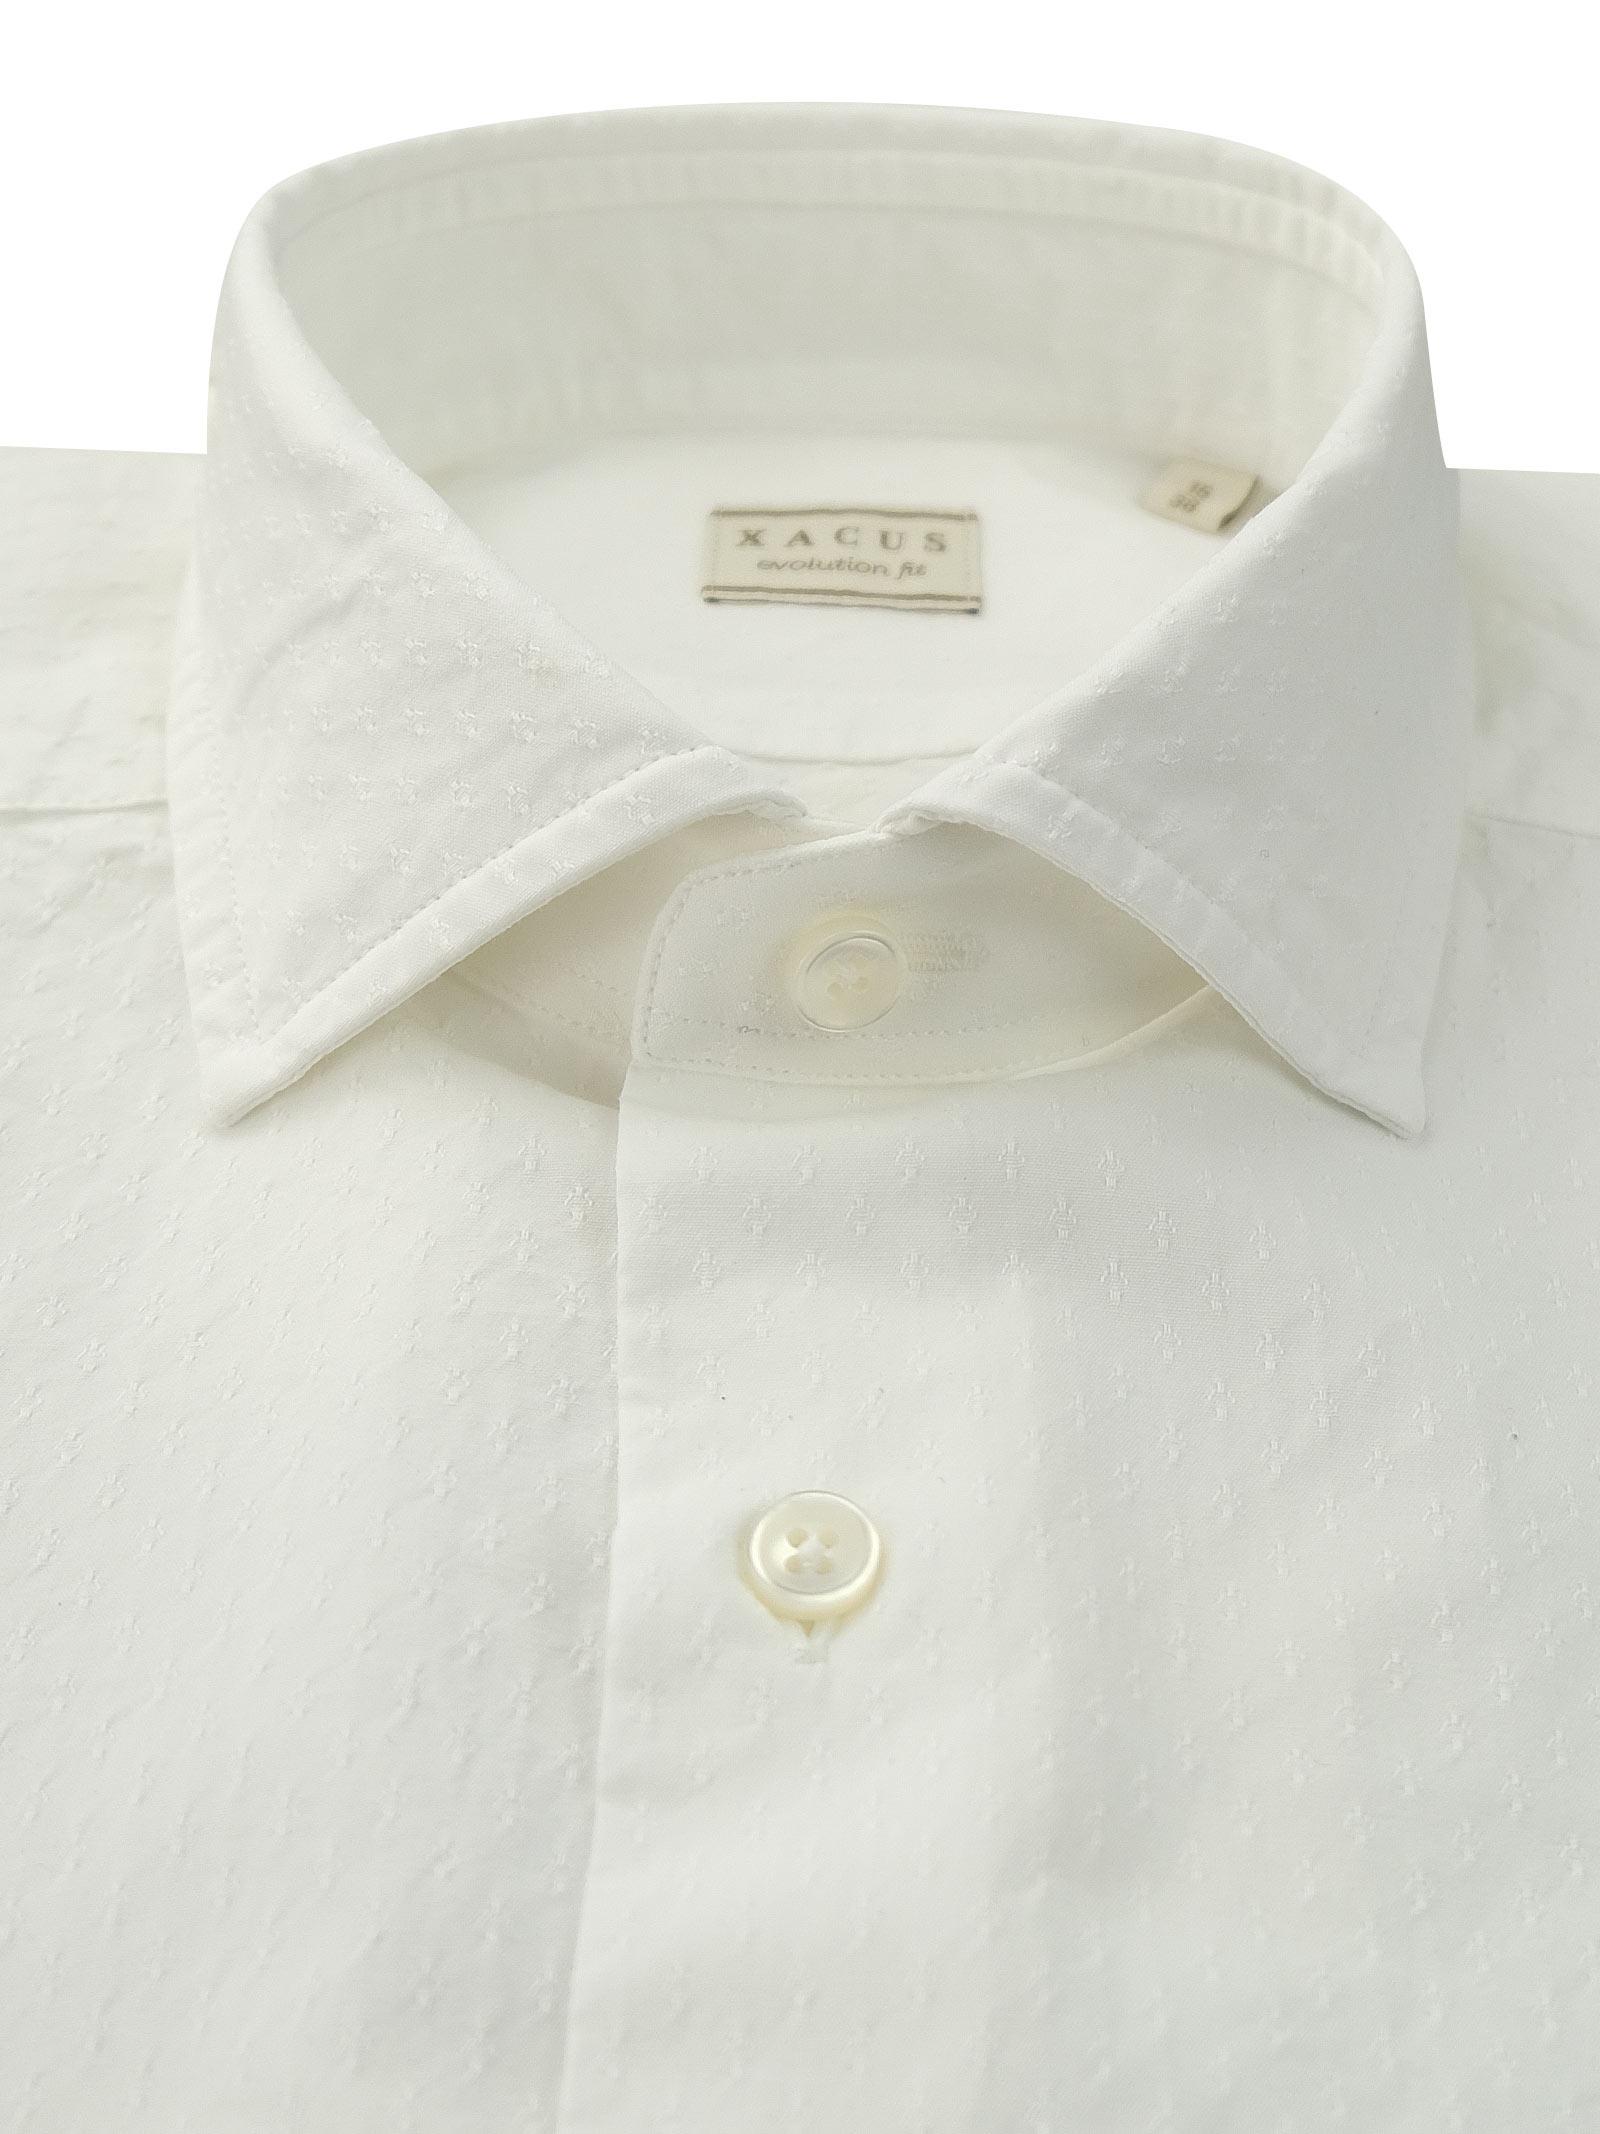 Camicia in cotone tinta unita XACUS   Camicie   848 81416001